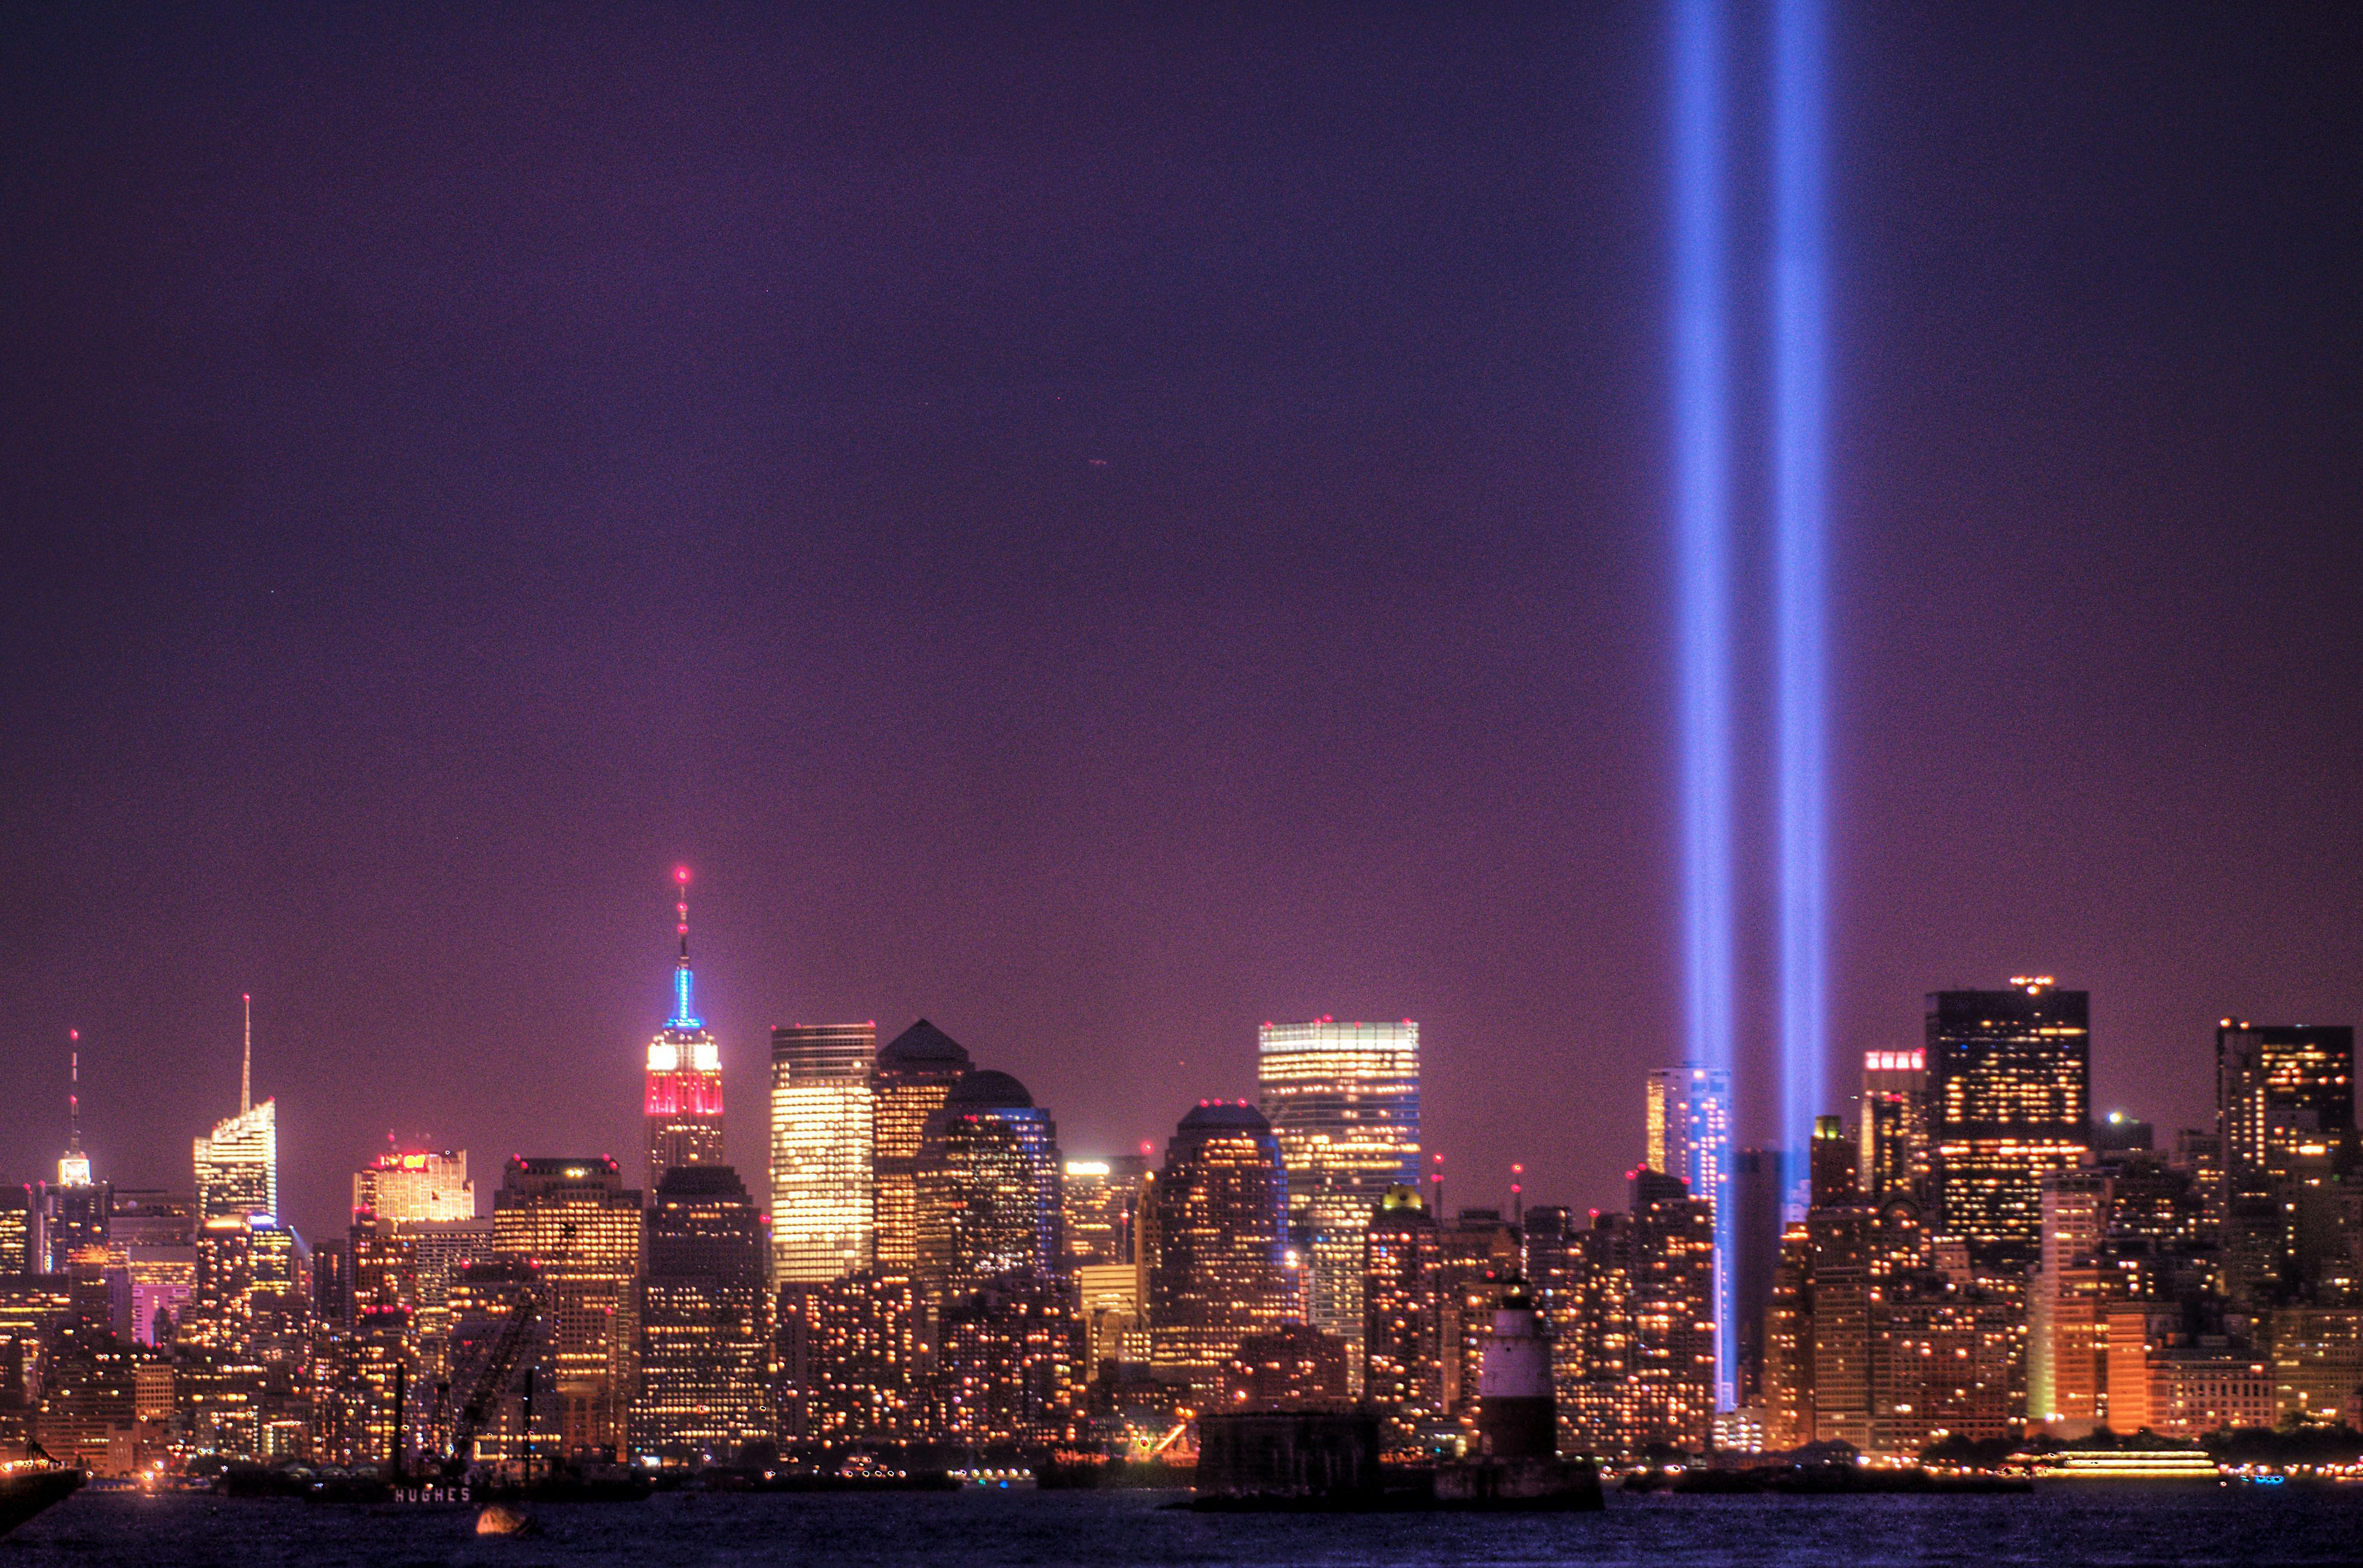 The September Memorials Of Brooklyn New York - Two beams light new yorks skyline beautiful tribute 911